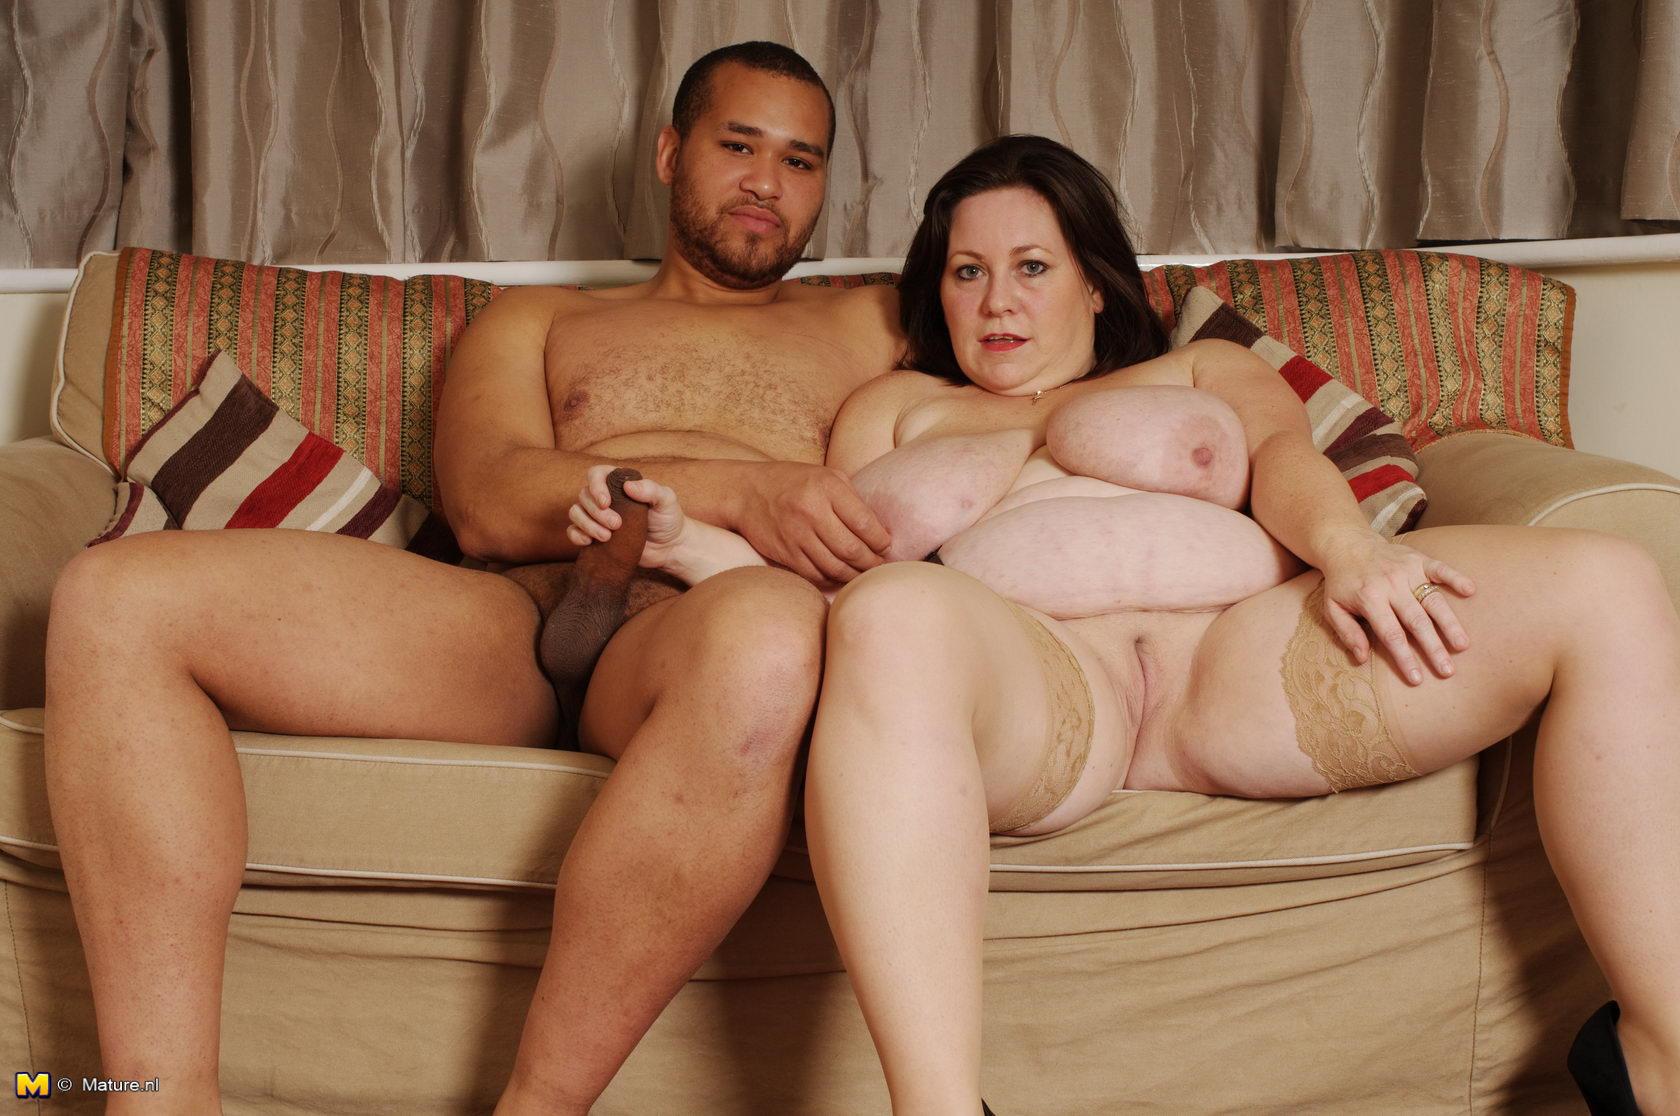 nude-fat-fat-family-sex-pics